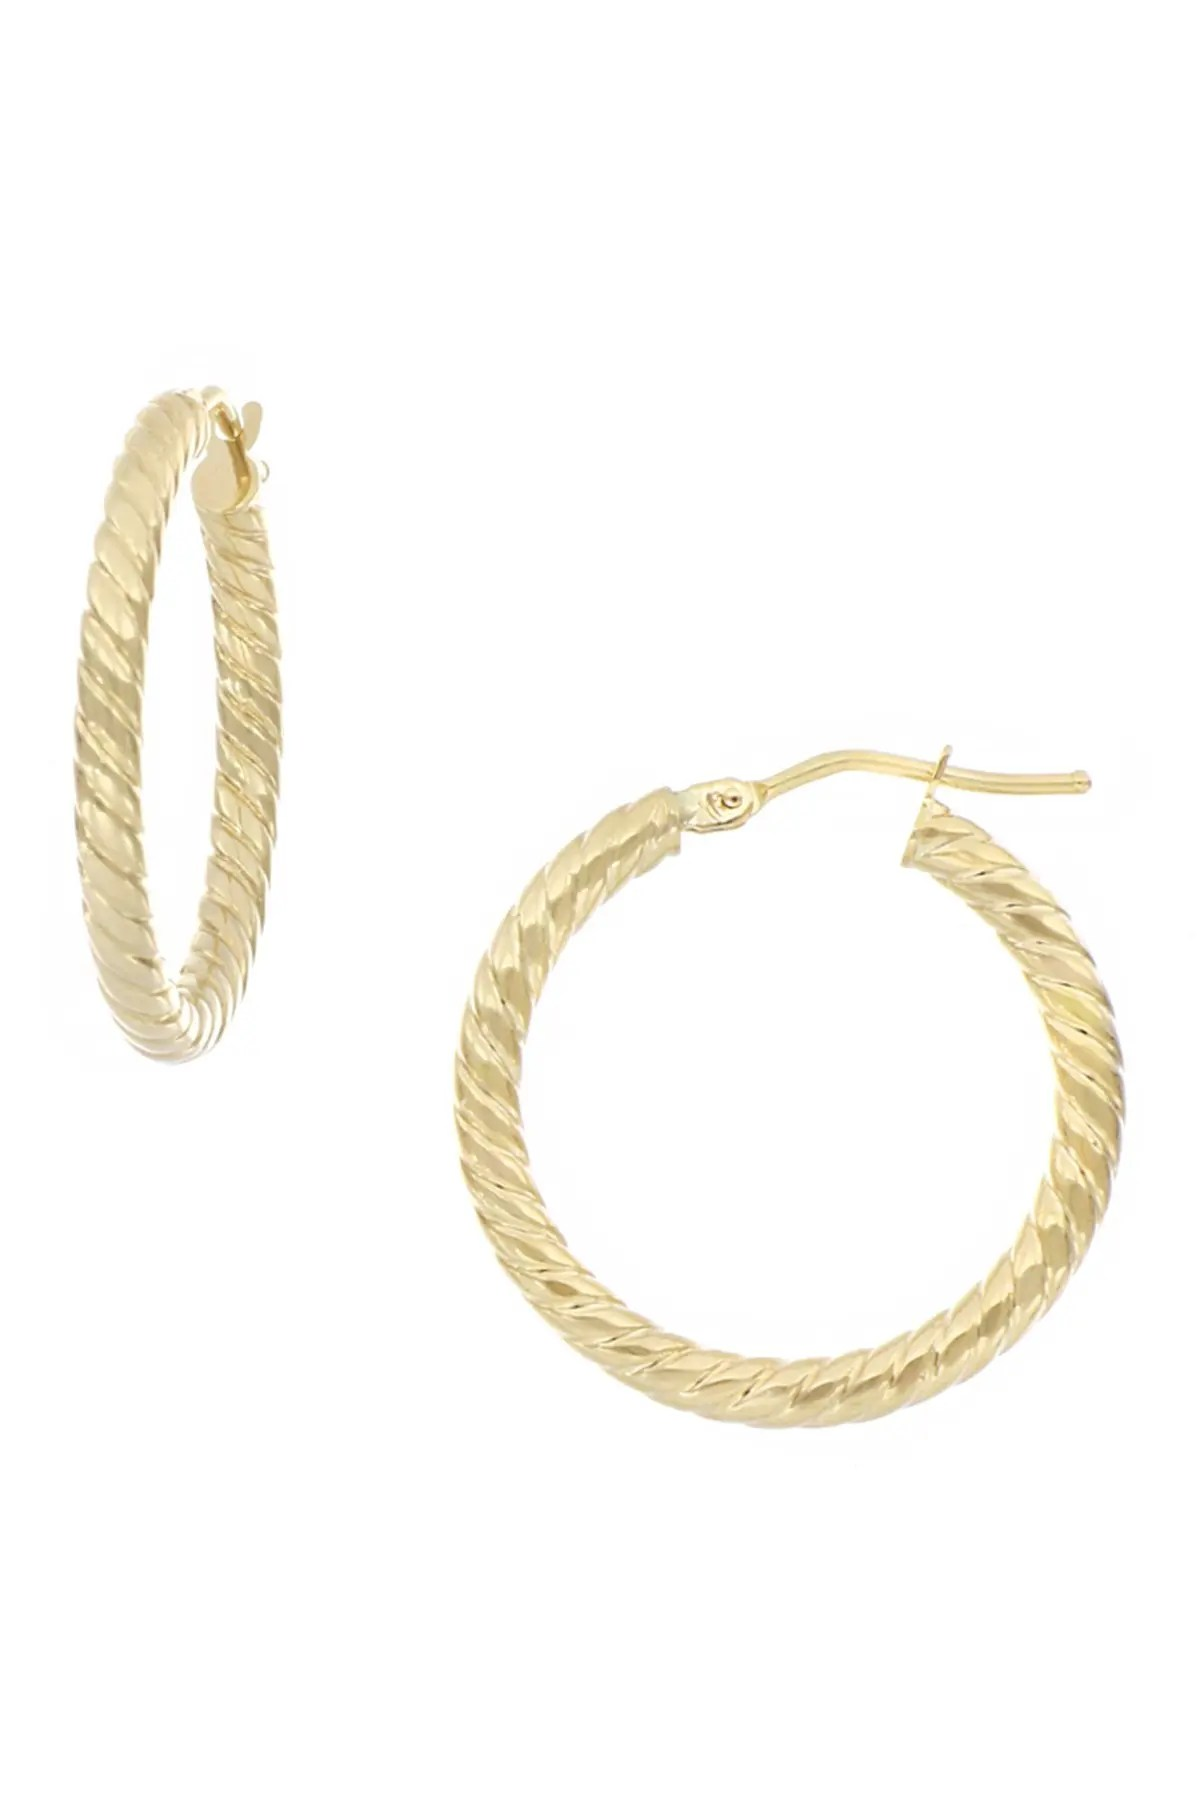 bony levy 14k yellow gold 20mm twisted hoop earrings nordstrom rack